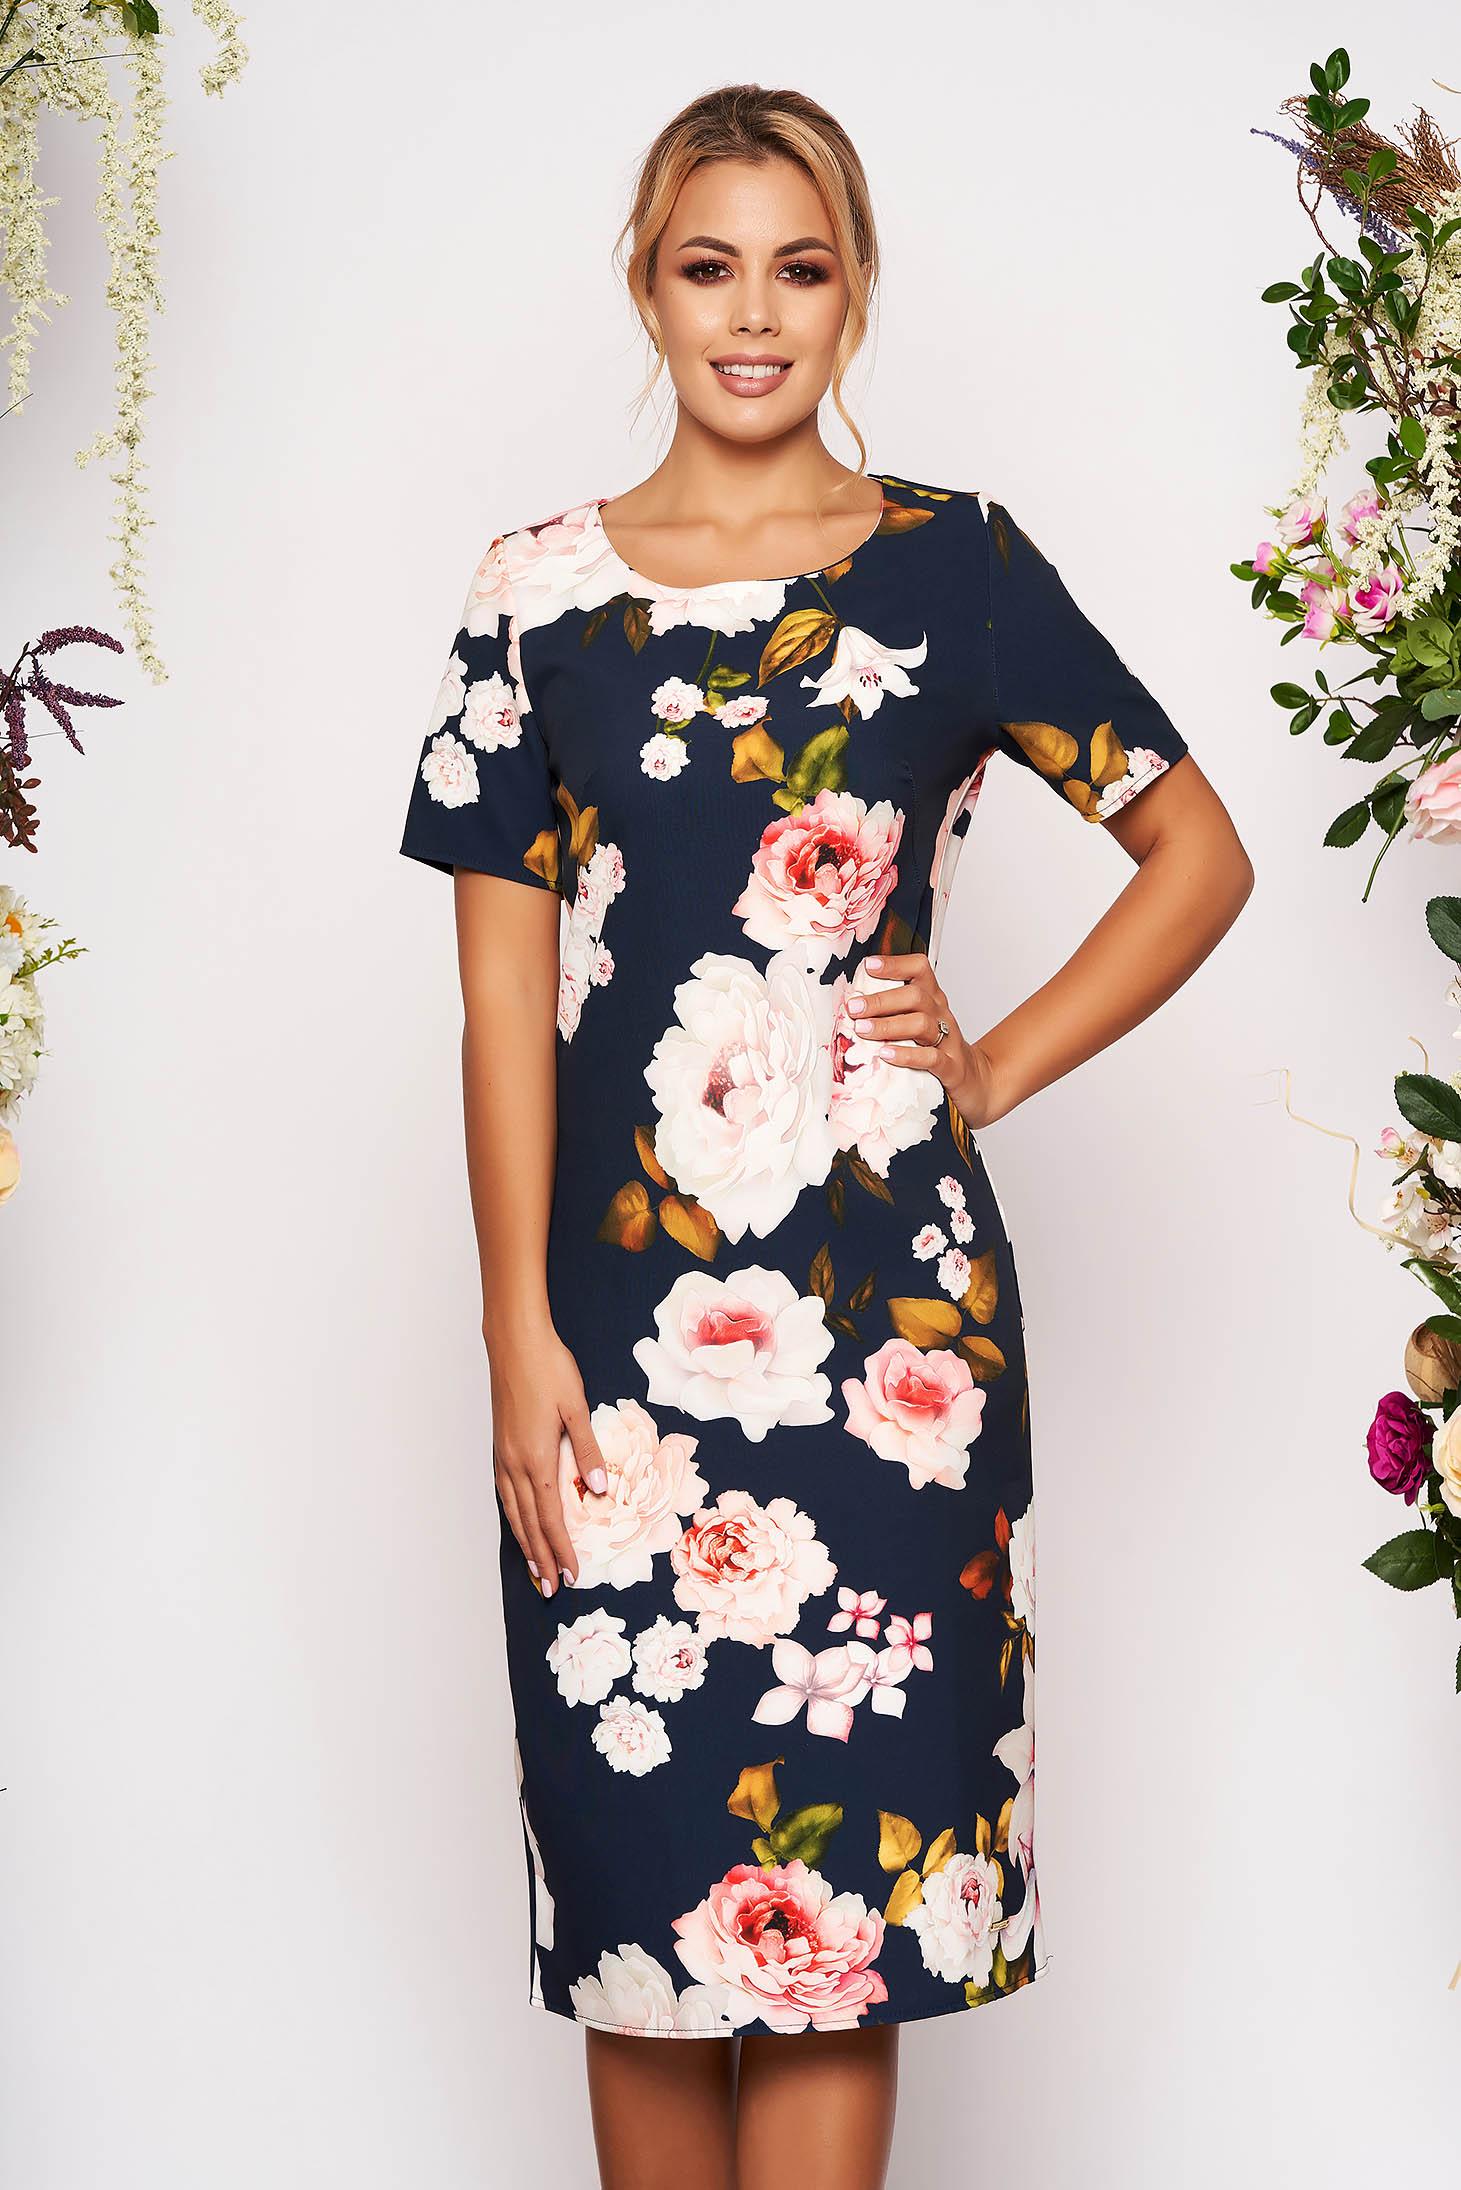 Darkblue dress short cut a-line short sleeves neckline with floral print